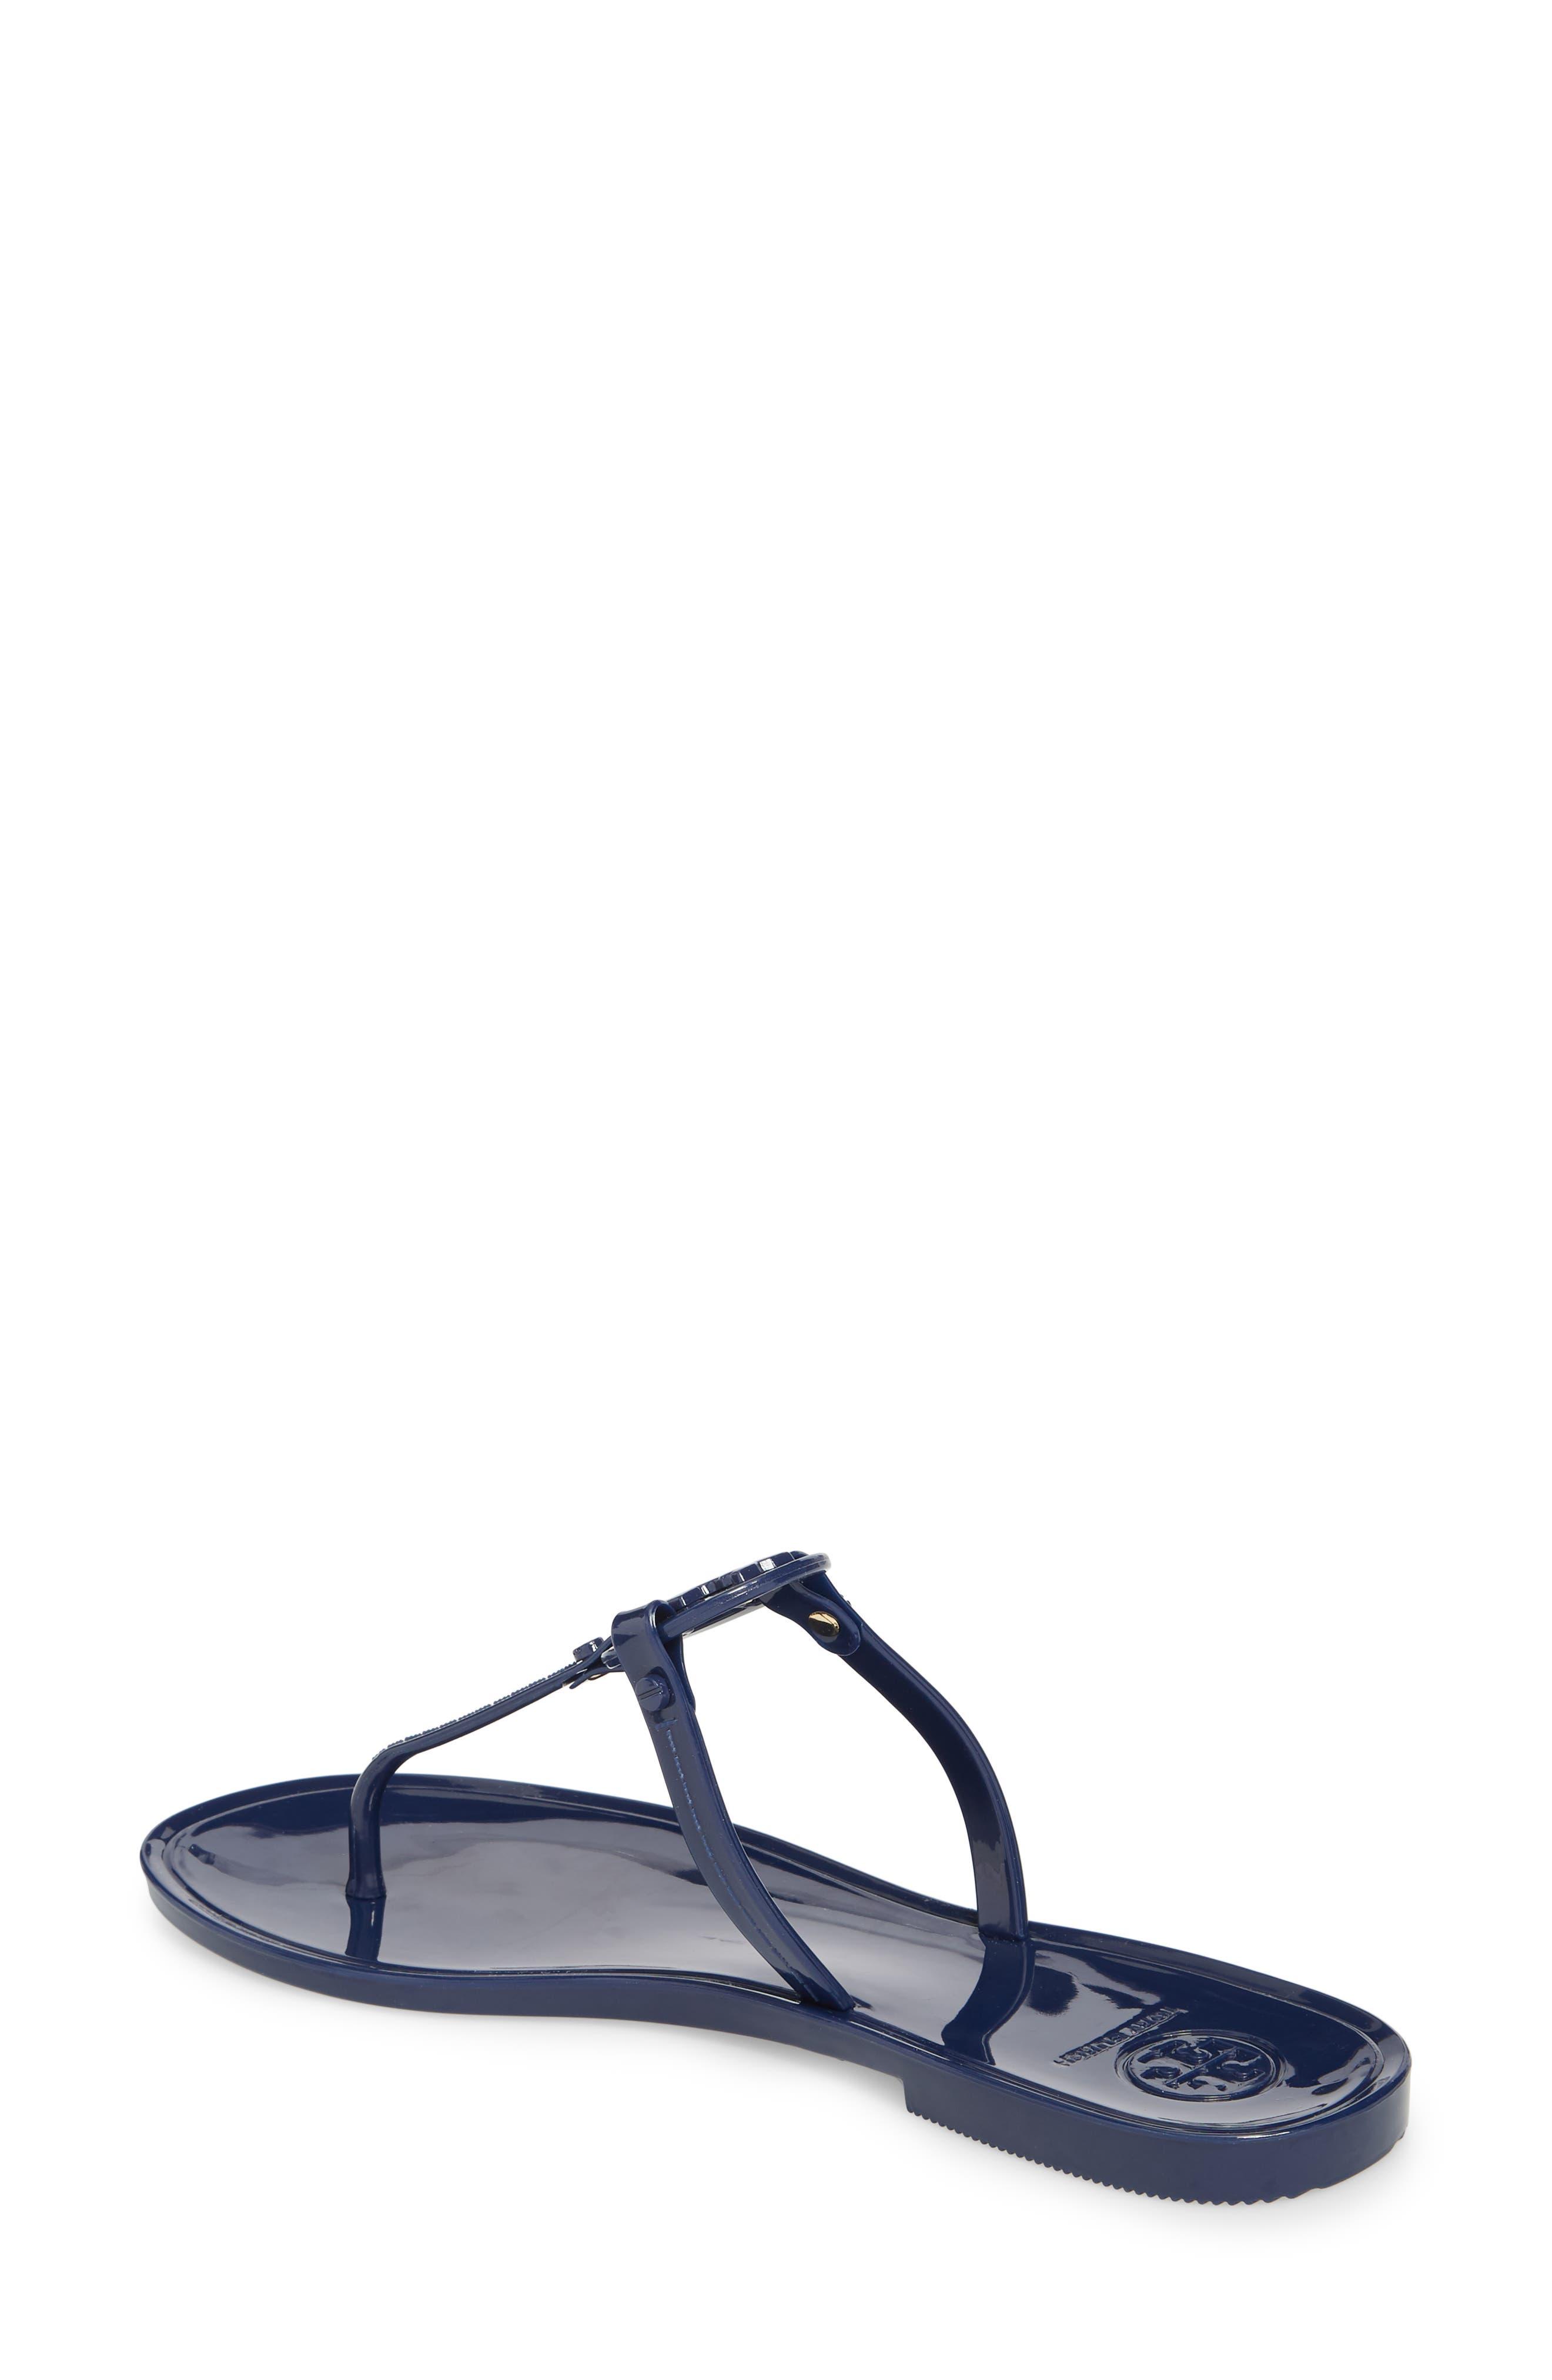 'Mini Miller' Flat Sandal,                             Alternate thumbnail 2, color,                             Bright Indigo